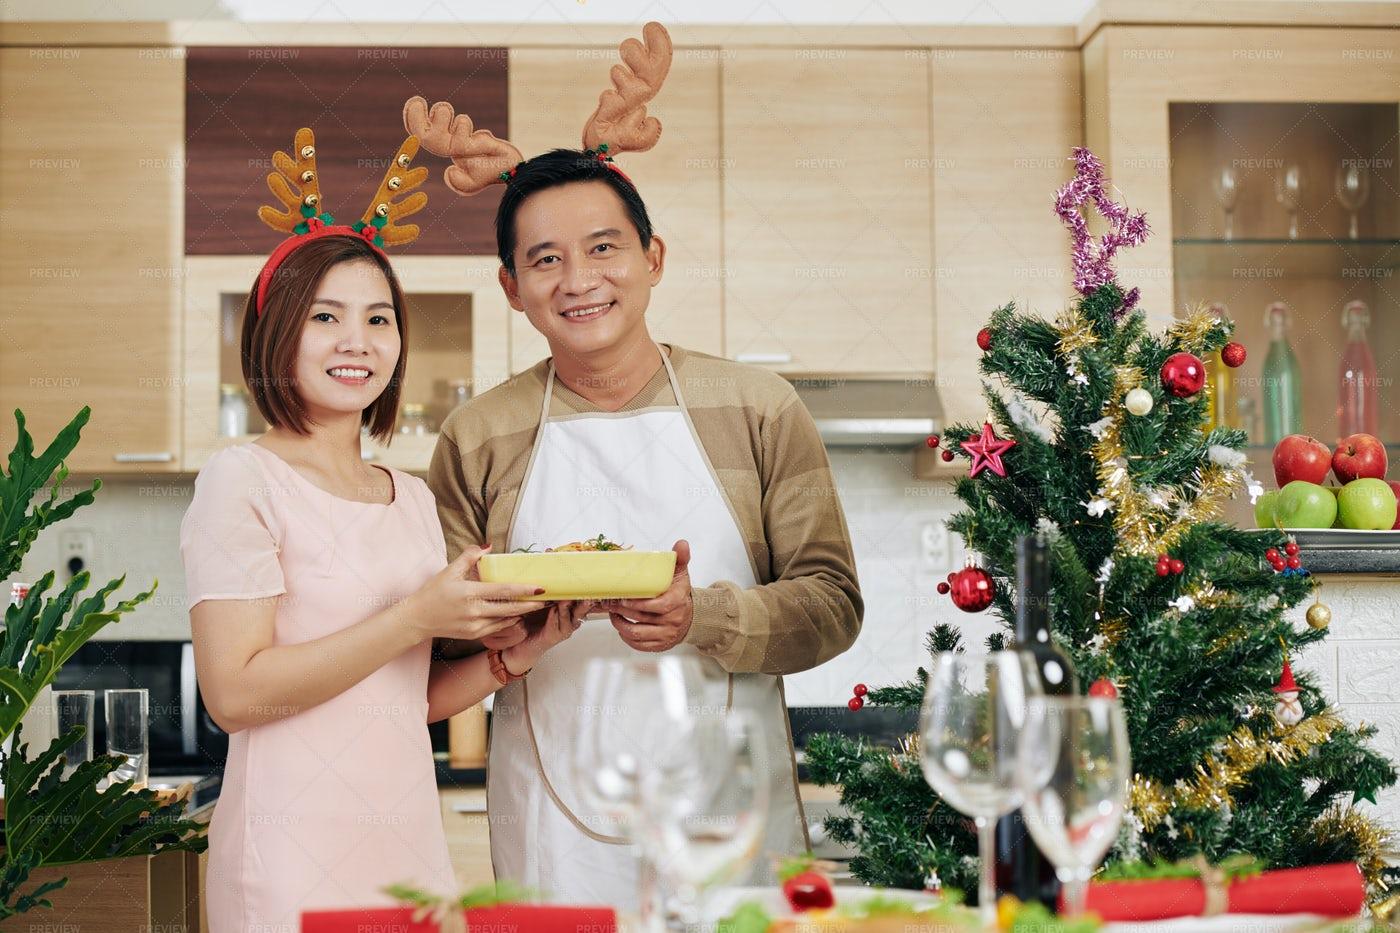 Couple Serving Christmas Dinner: Stock Photos